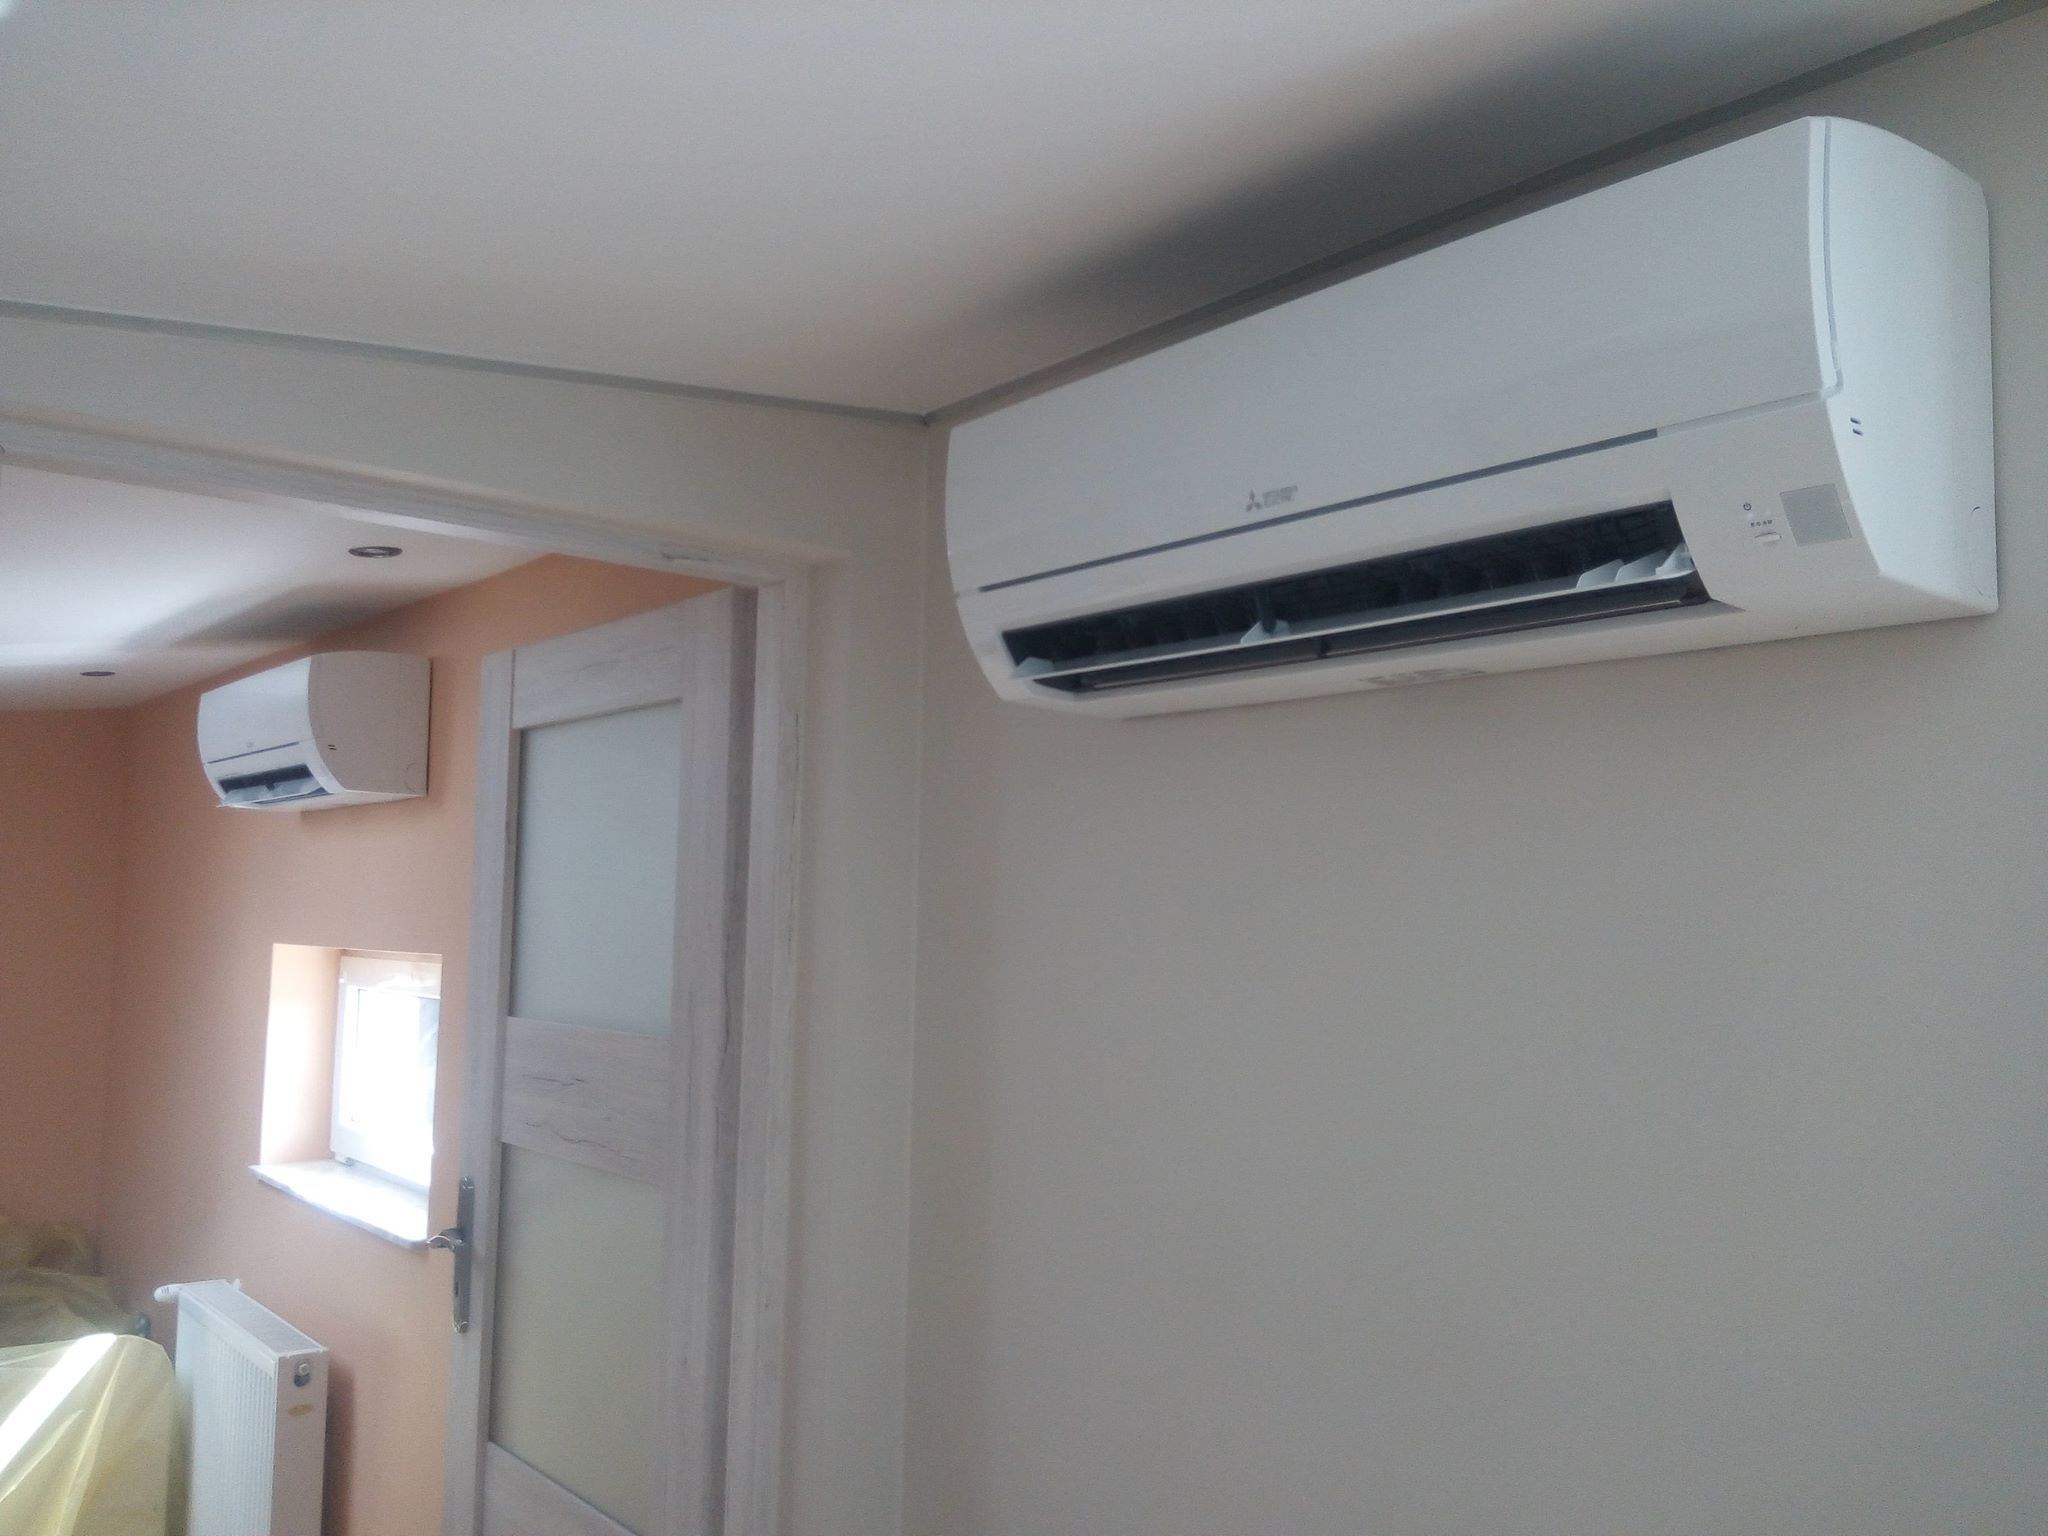 klimatyzator do sypialni Mitsubishi Starachowice